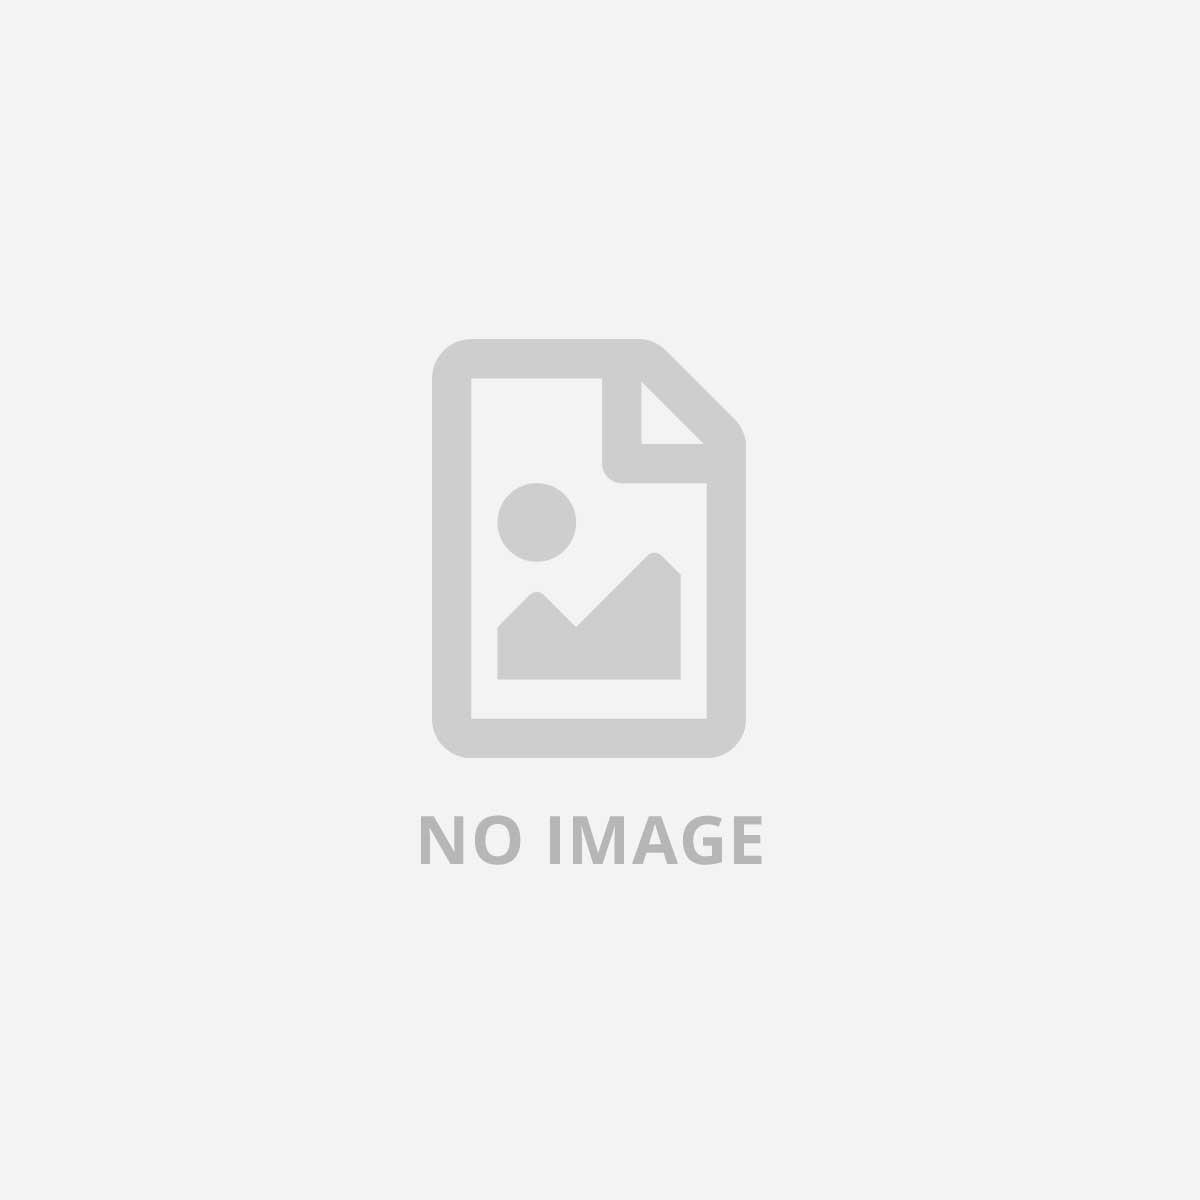 AOPEN ETILE-X 19M N2930